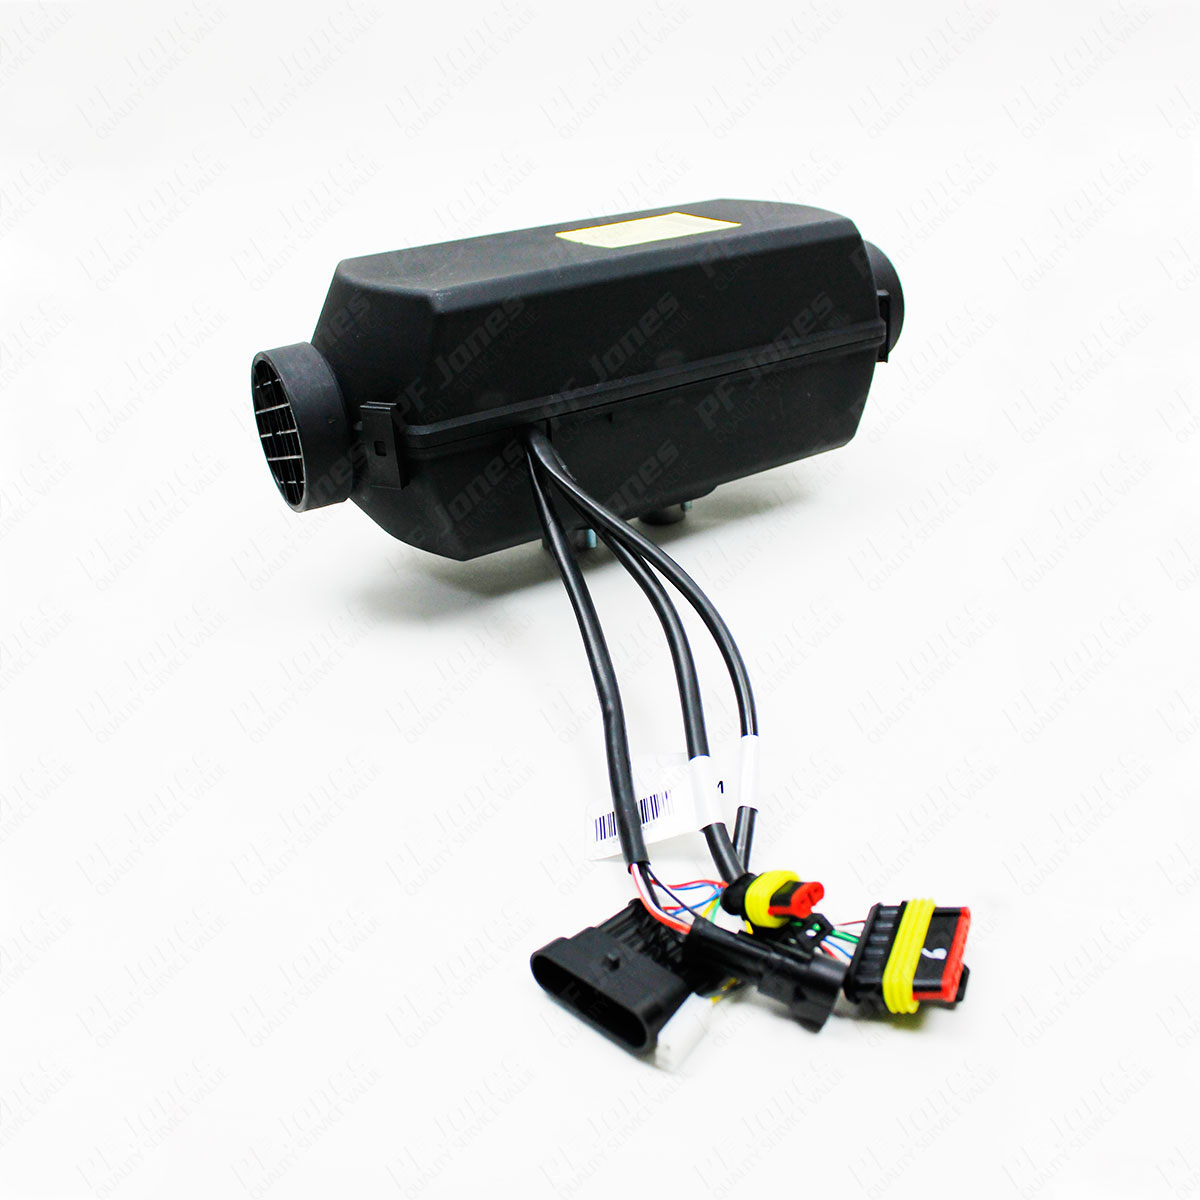 Planar 2D-24-TM Air Heater 2kW/24V - Universal Kit